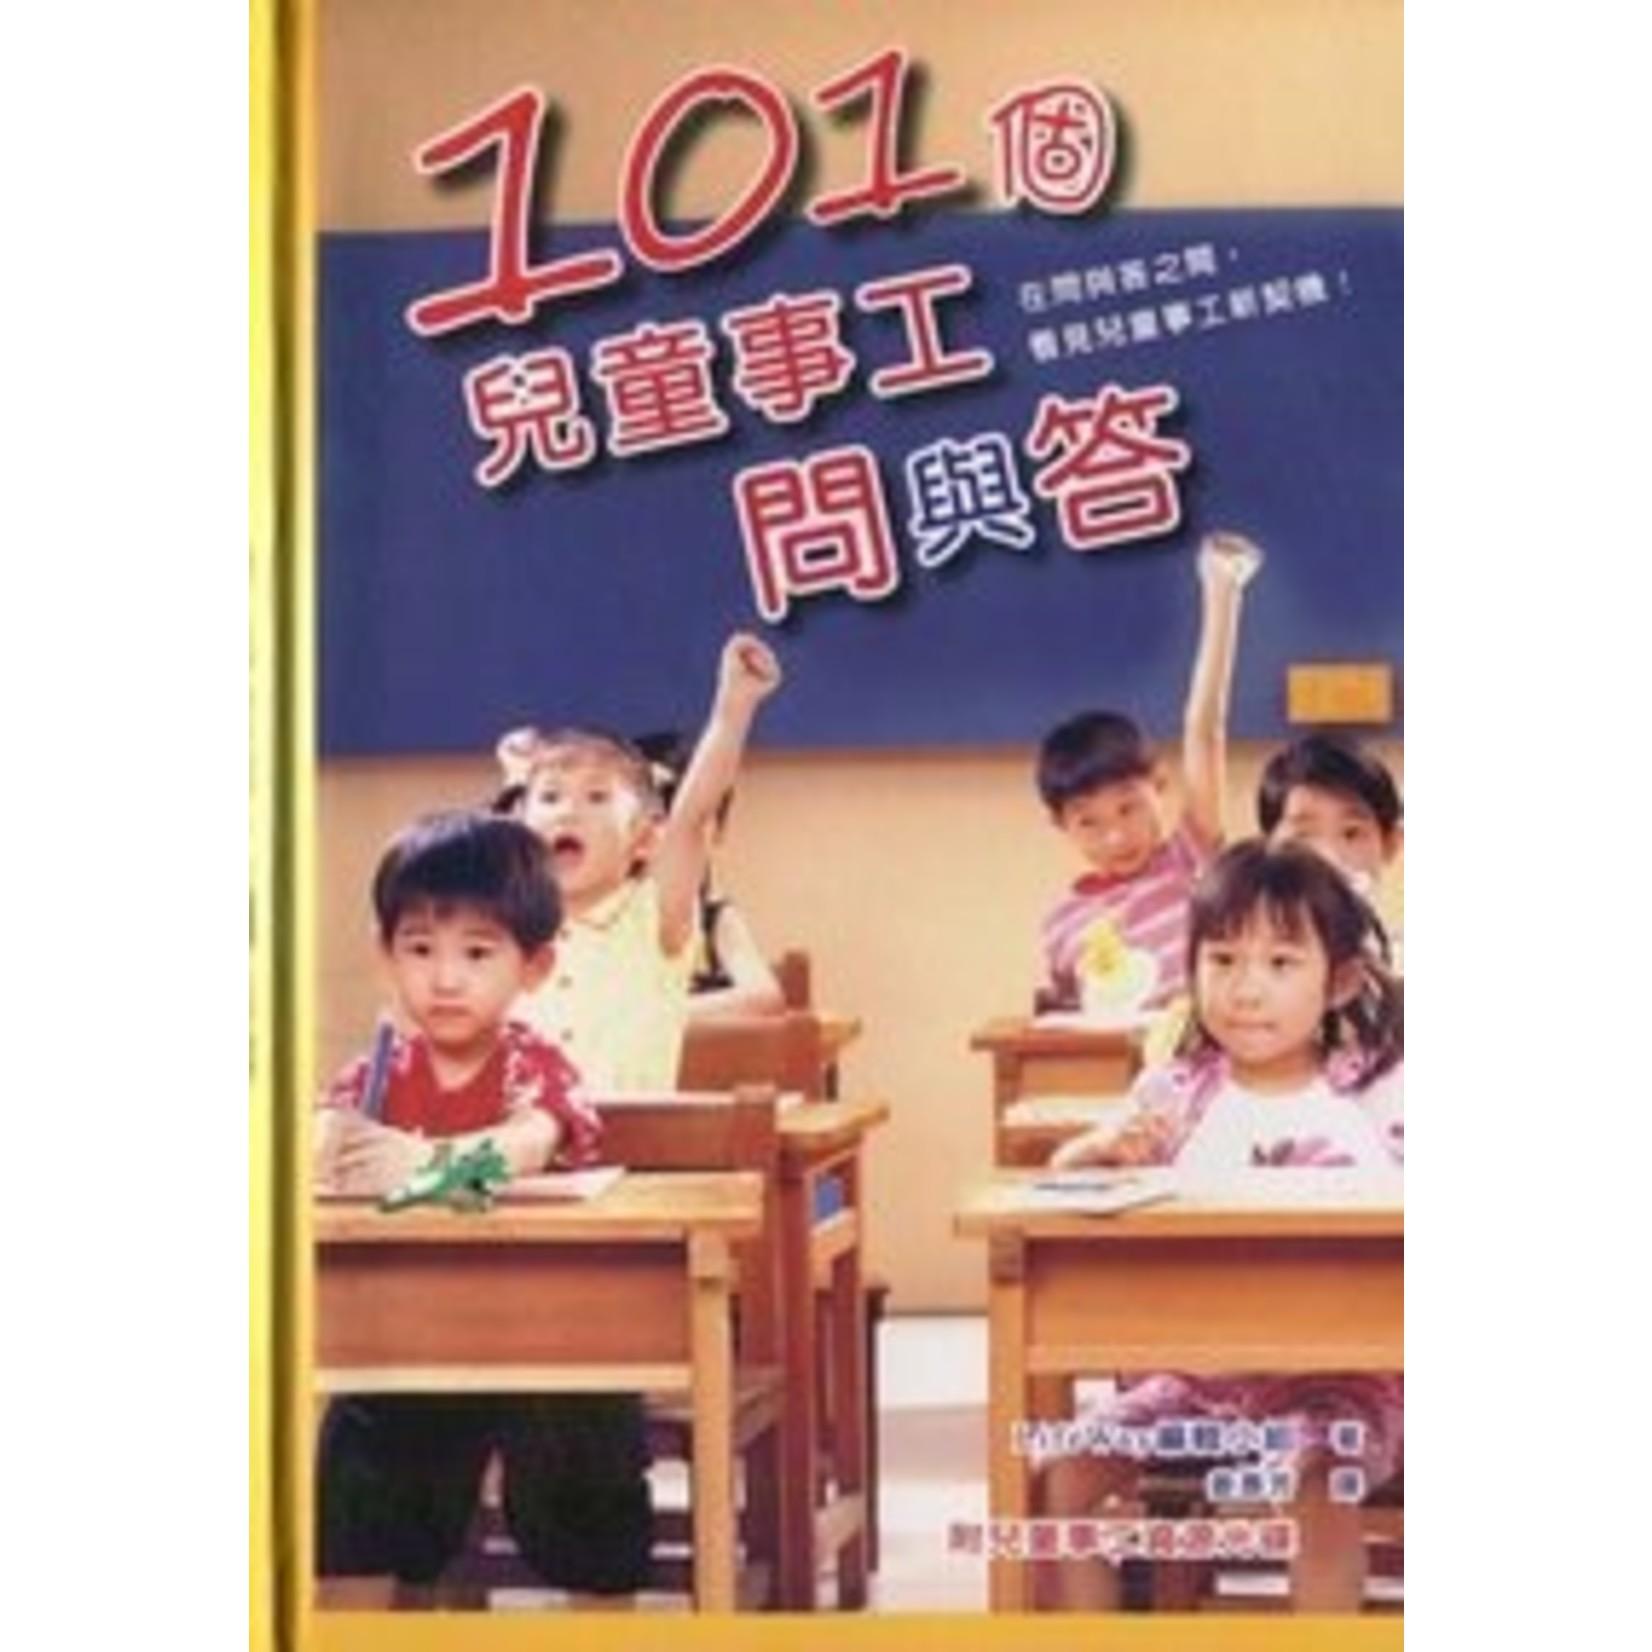 中國主日學協會 China Sunday School Association 101個兒童事工問與答 Kids Ministry 101: Practical Answers to Question About Kids Ministry